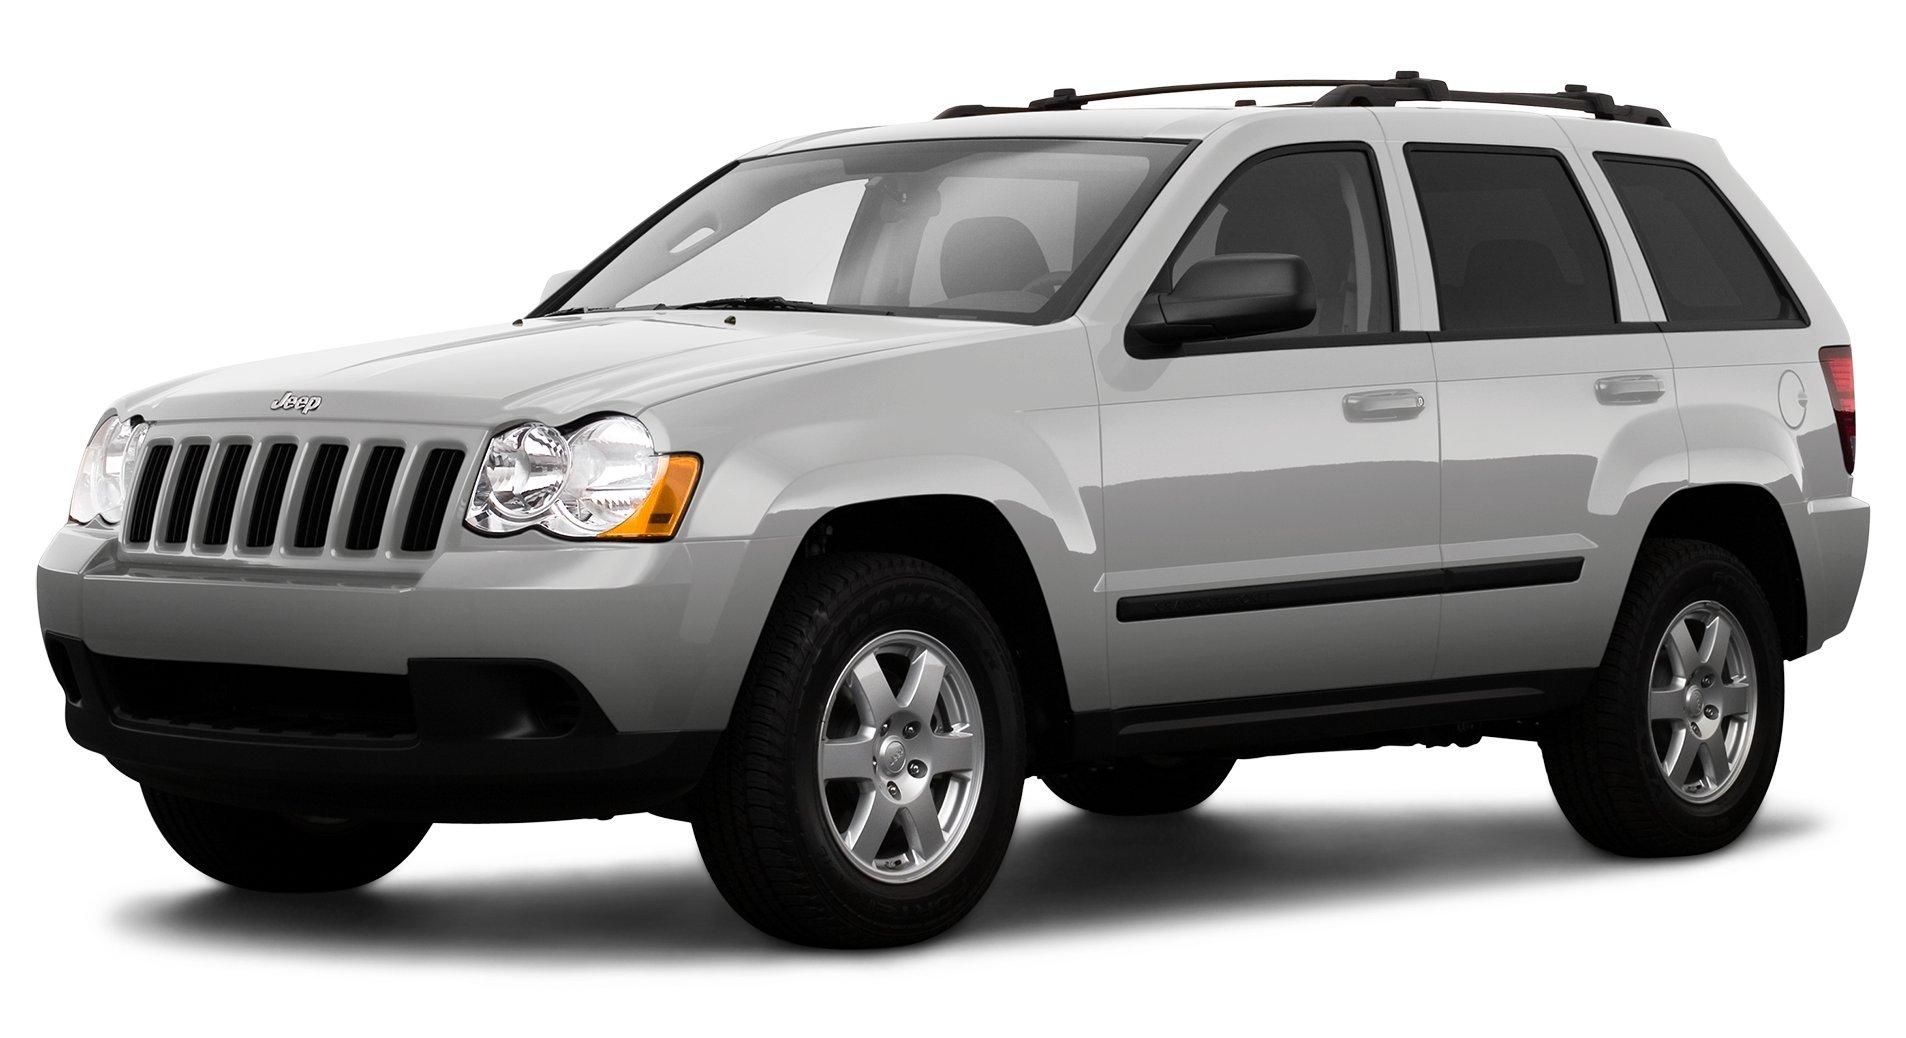 2009 Jeep Grand Cherokee Laredo >> 2009 Jeep Grand Cherokee